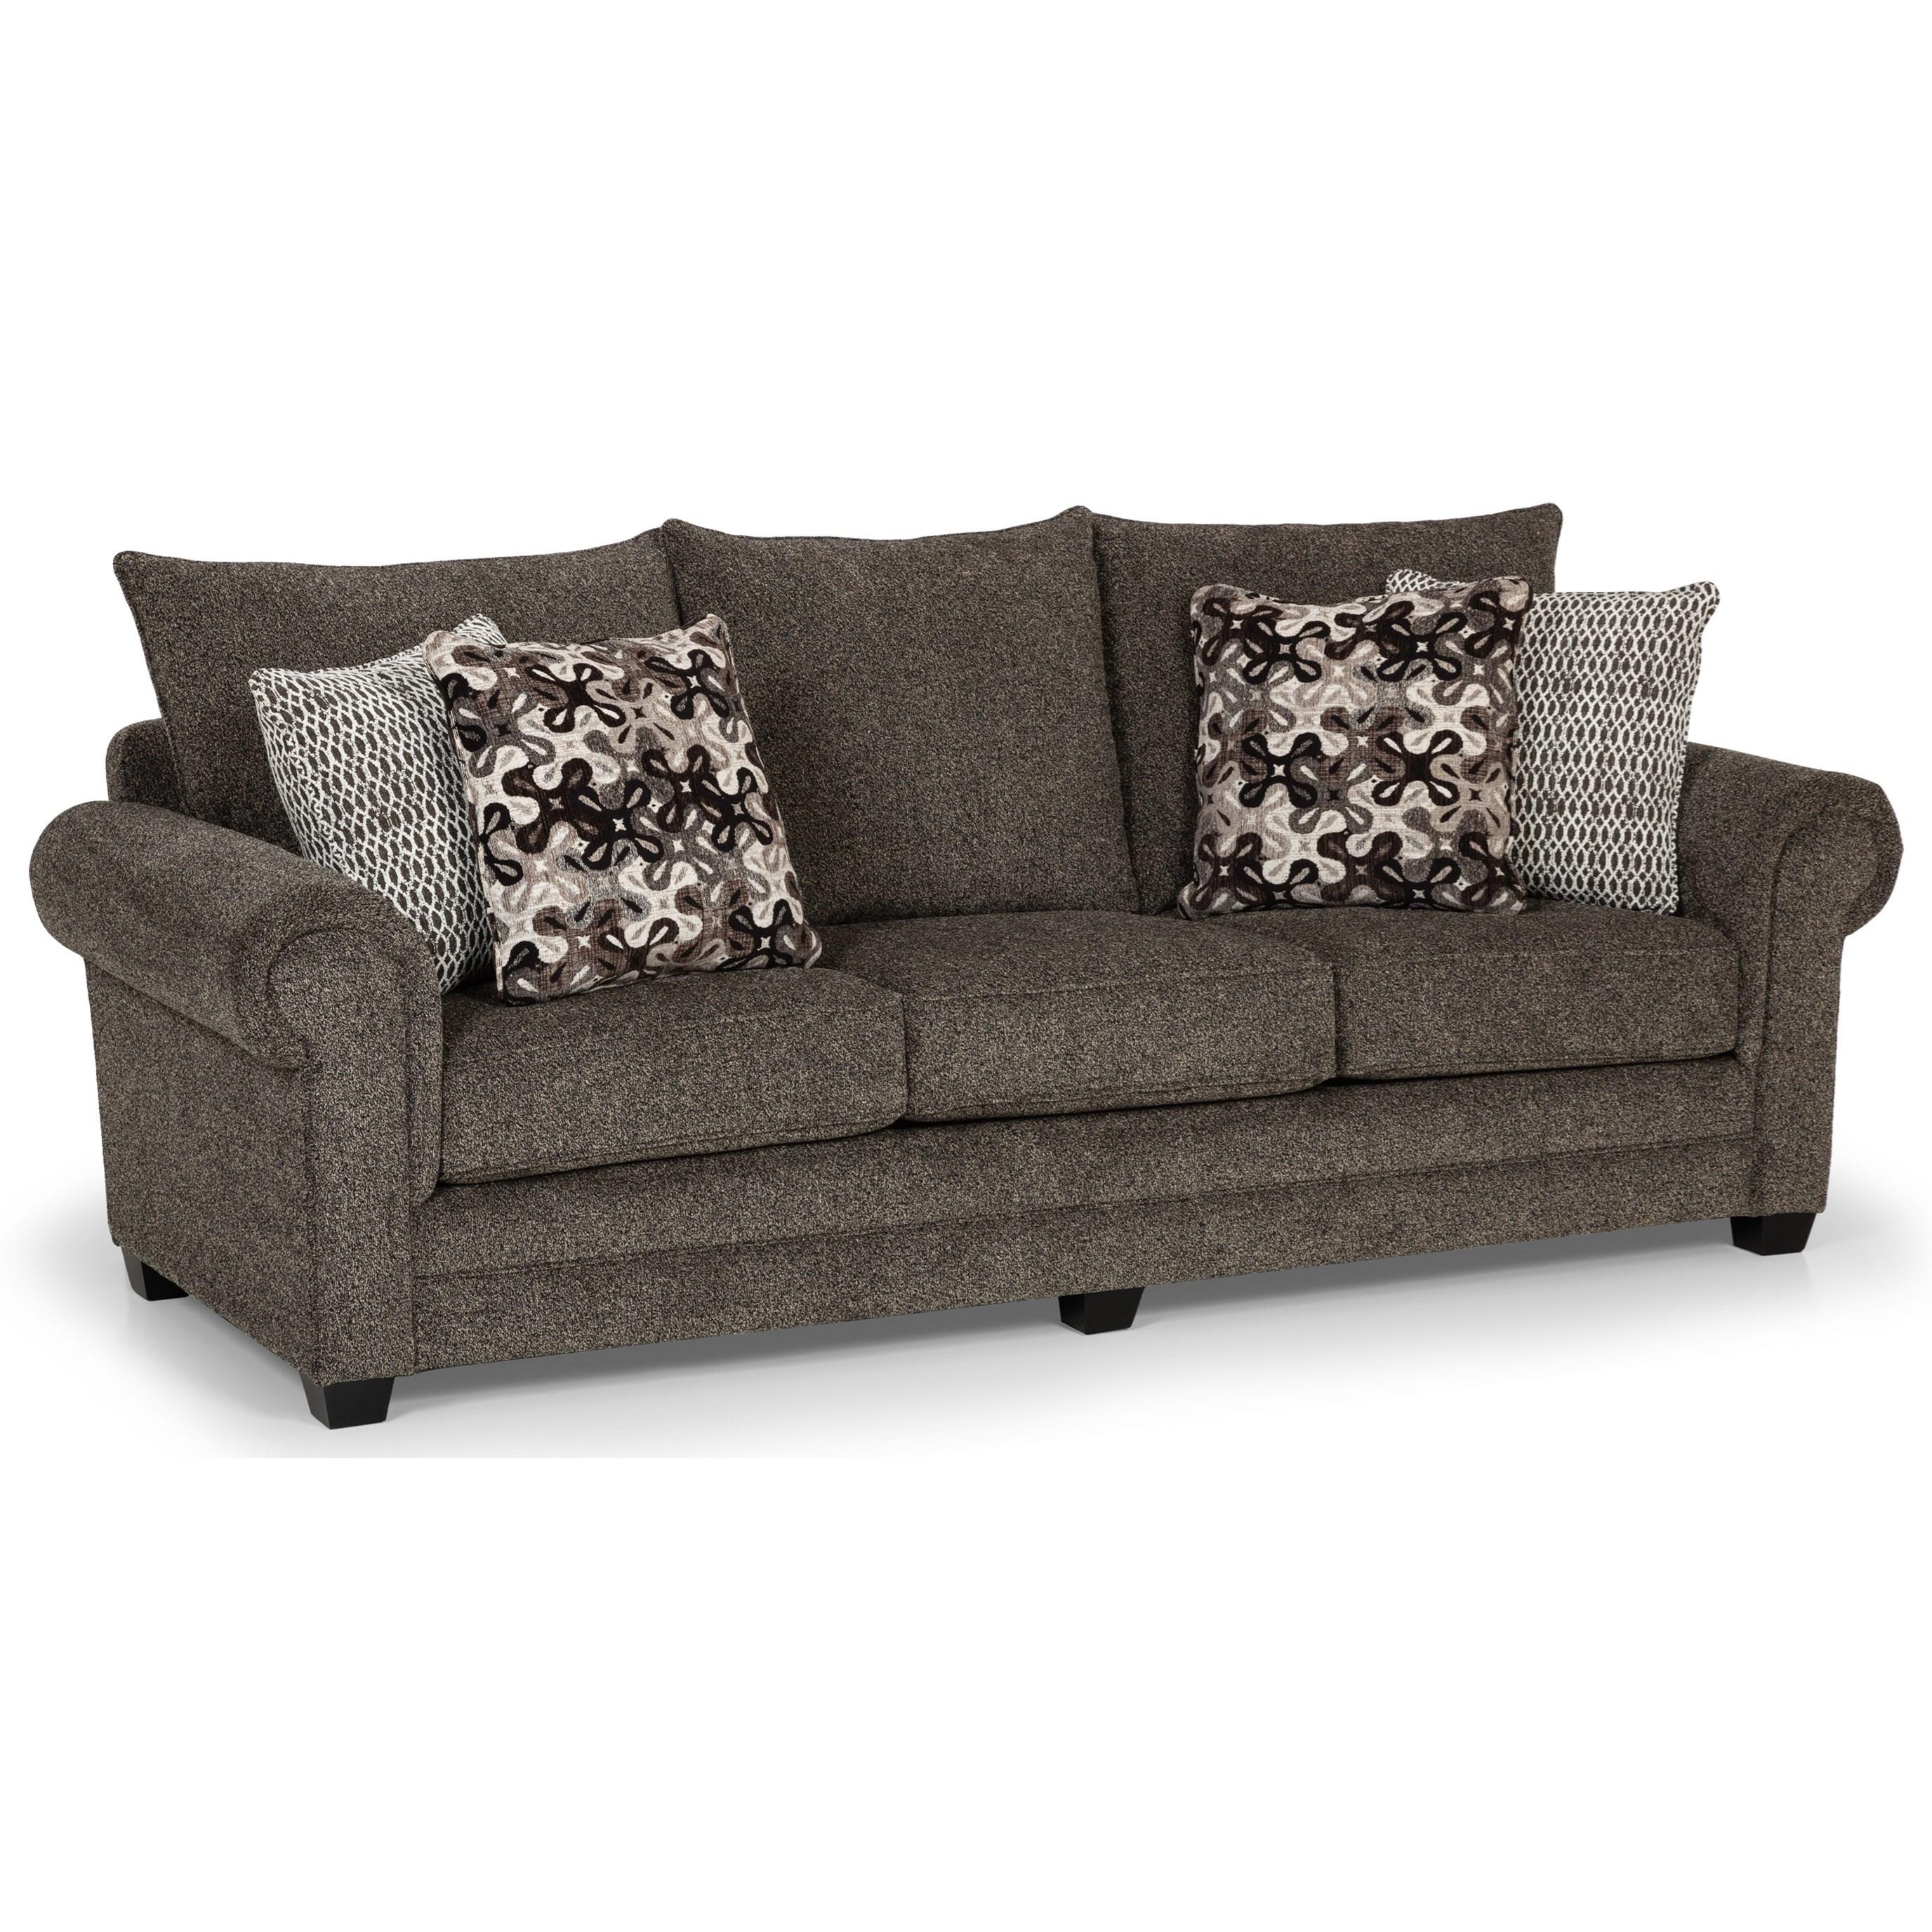 Superieur Rifeu0027s Home Furniture